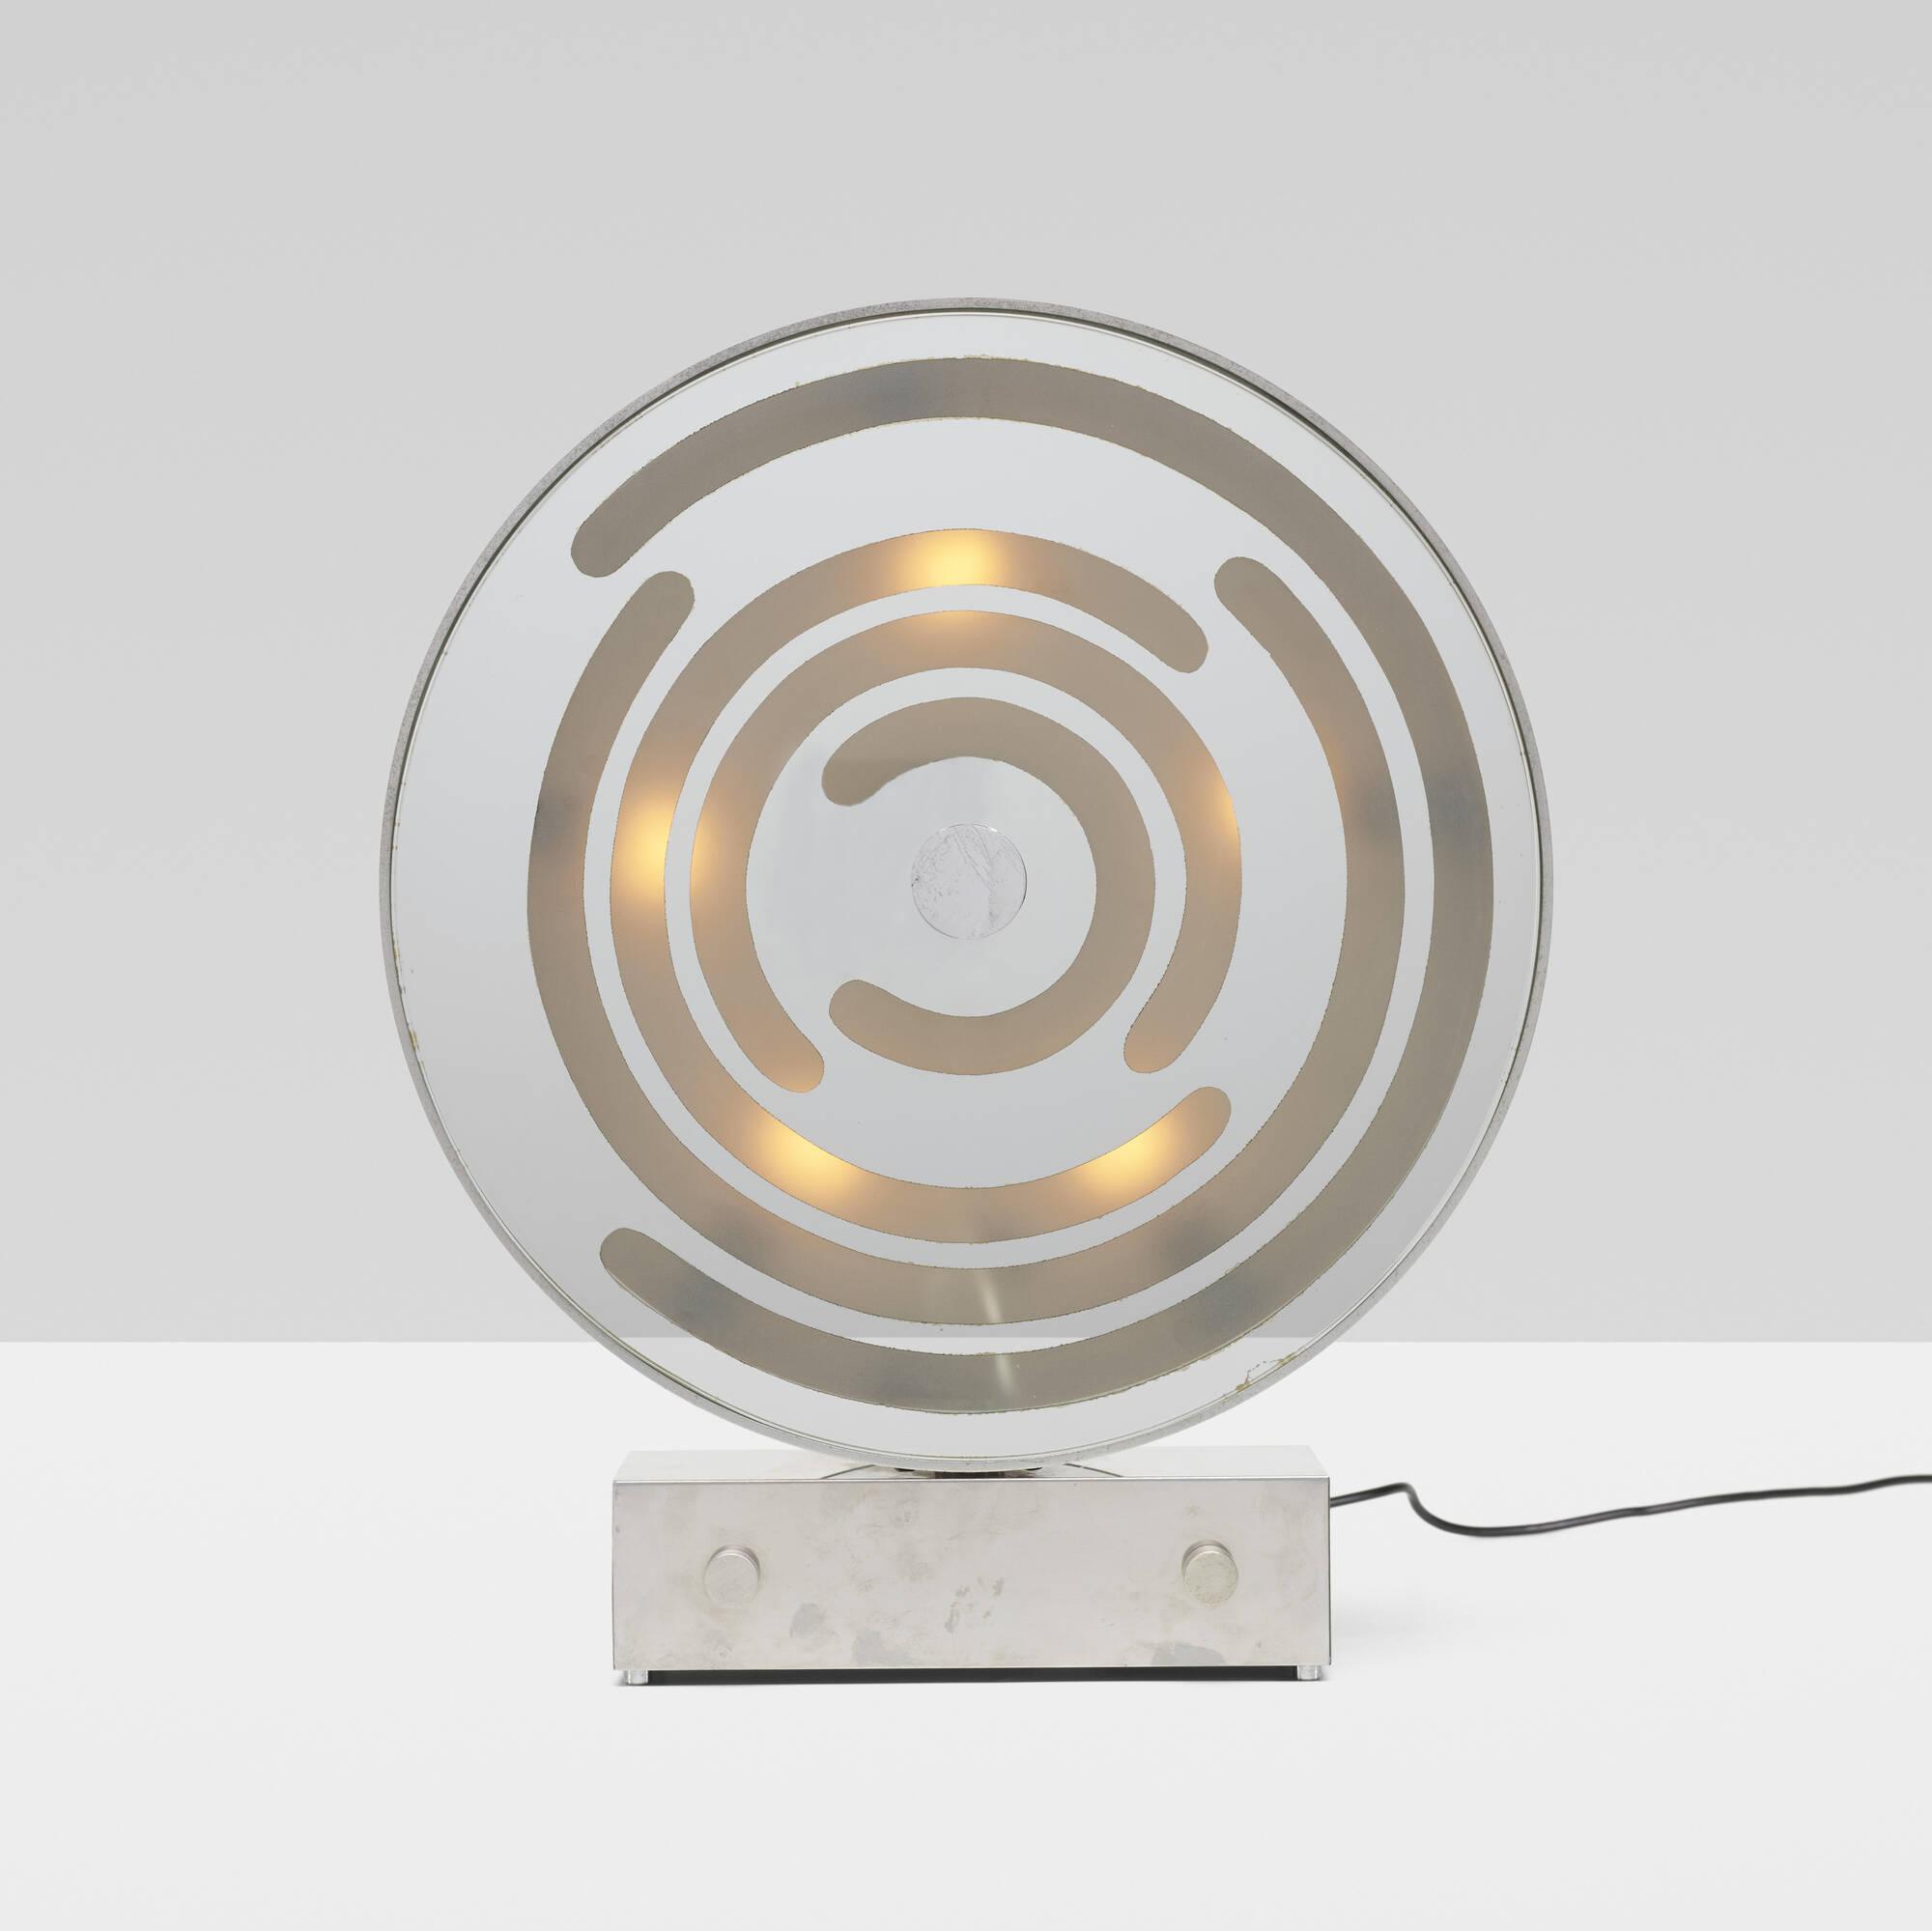 303: Innocente Gandini / Sunlight table lamp (1 of 5)